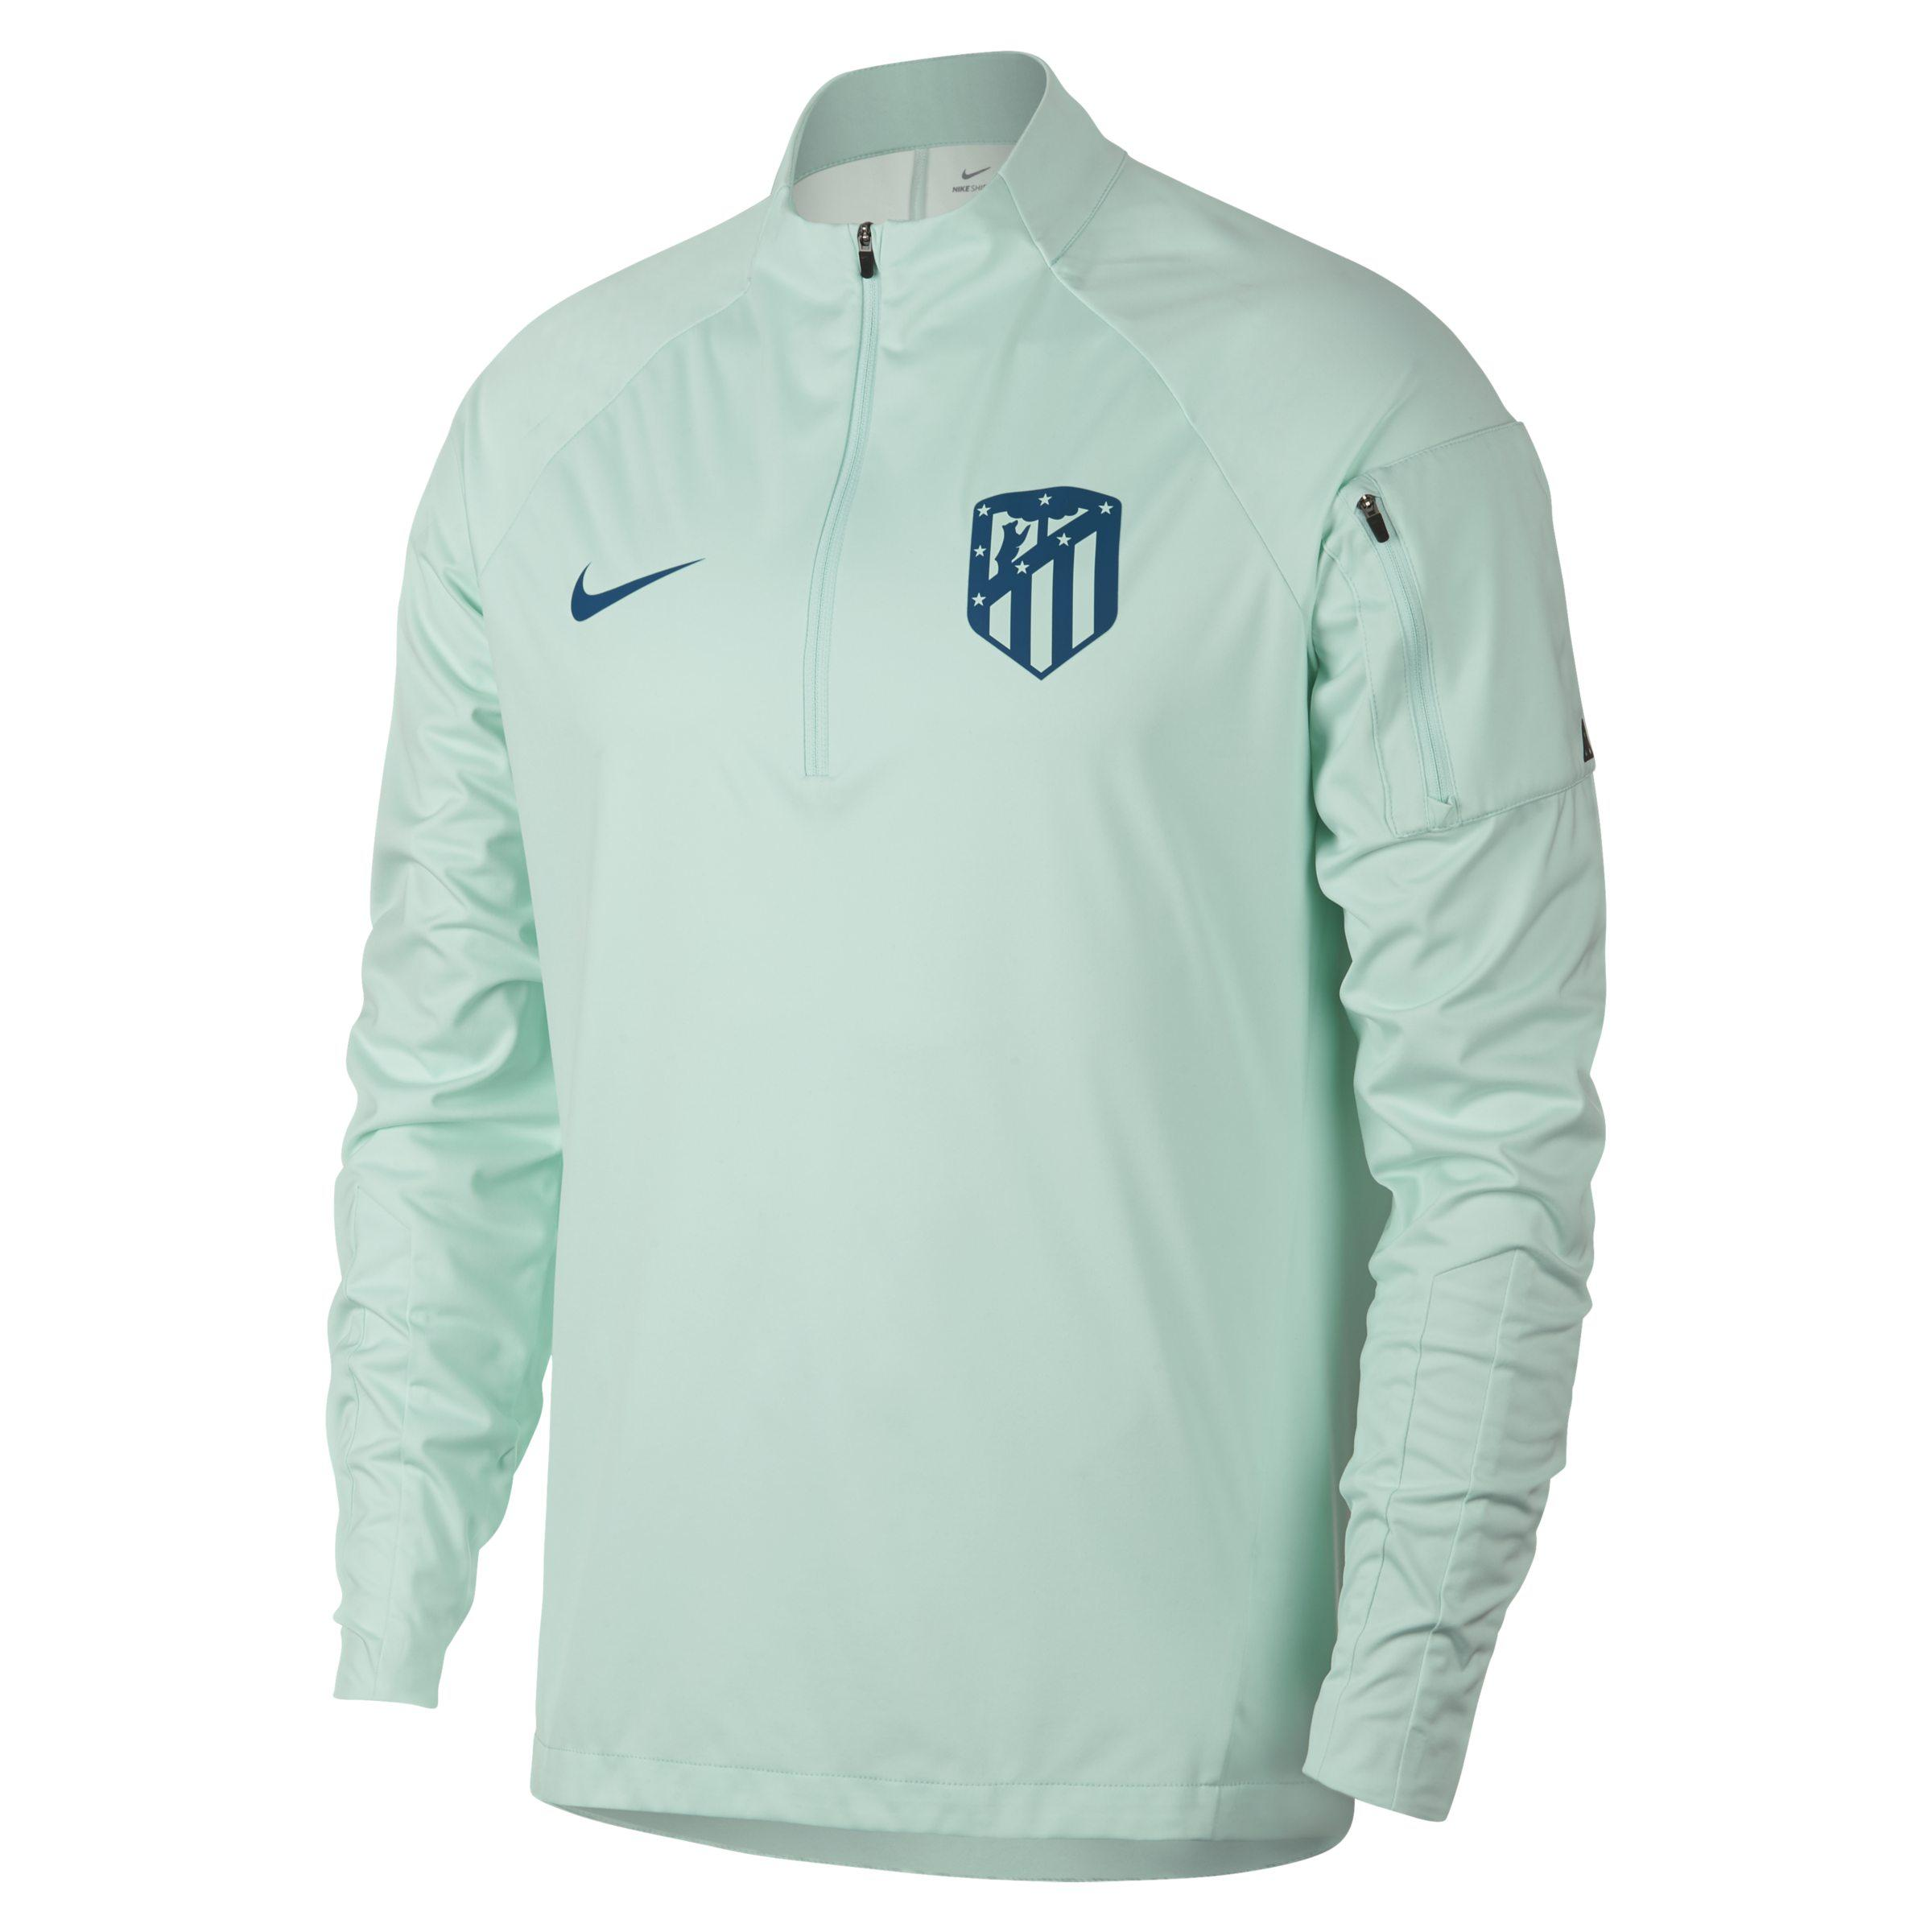 db18cb92b Nike - Green Atlético De Madrid Shield Squad Football Drill Top for Men -  Lyst